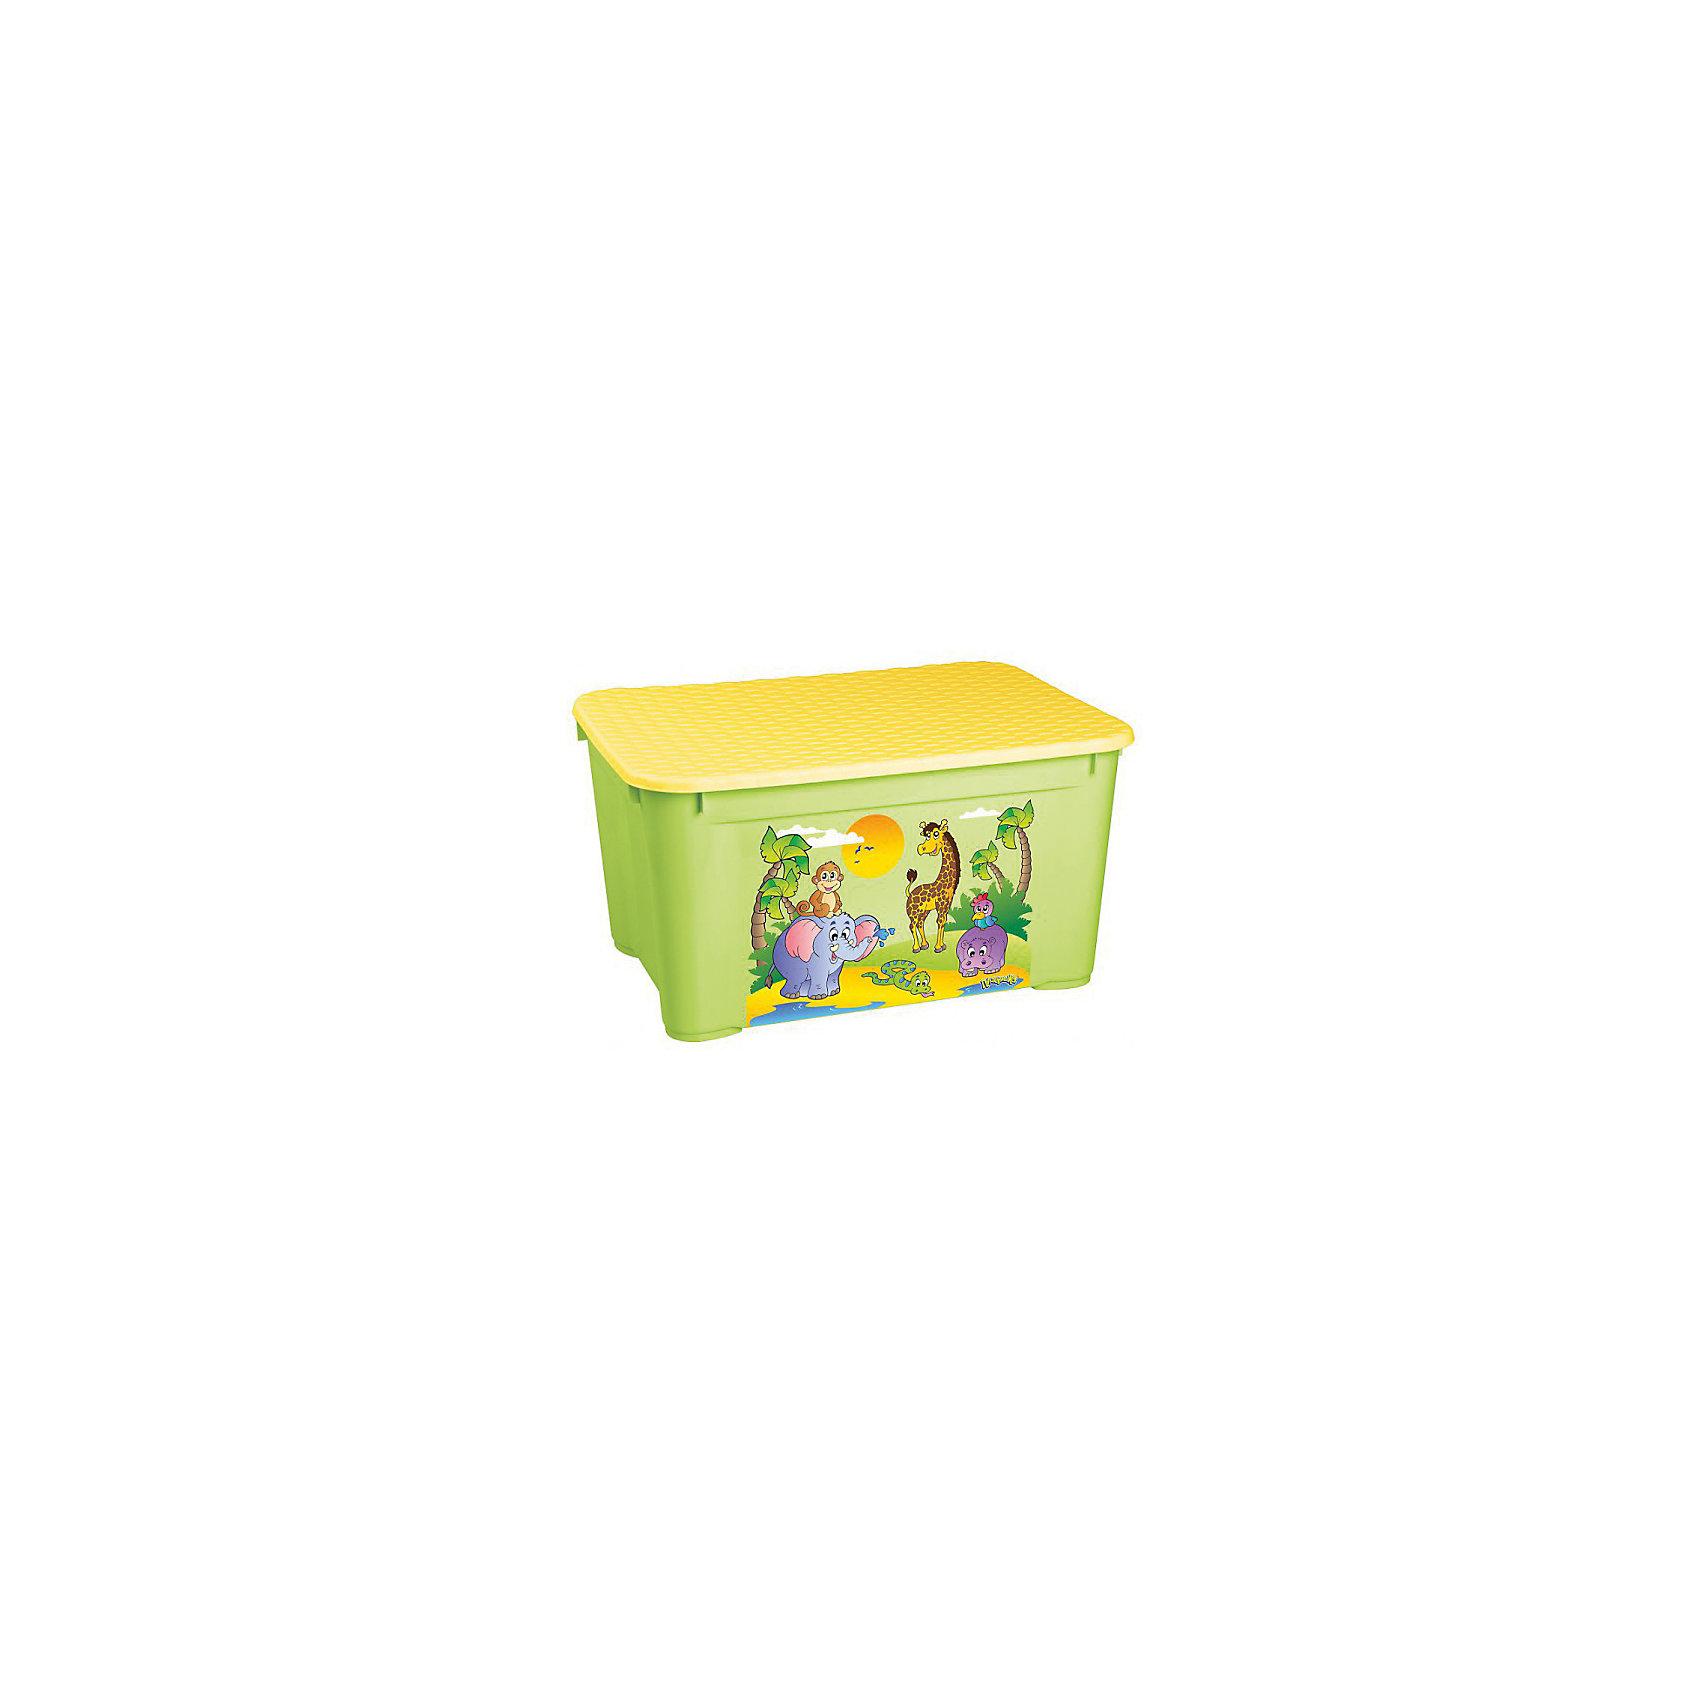 Пластишка Ящик для игрушек 555х390х290 мм, Пластишка, зеленый пластишка горка для купания детей пластишка